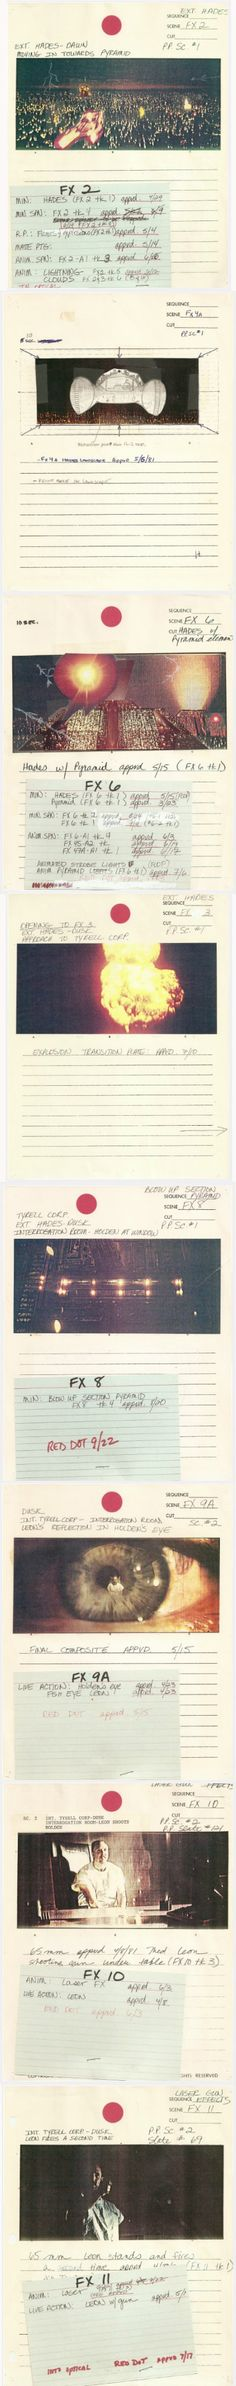 Blade Runner Story Boards